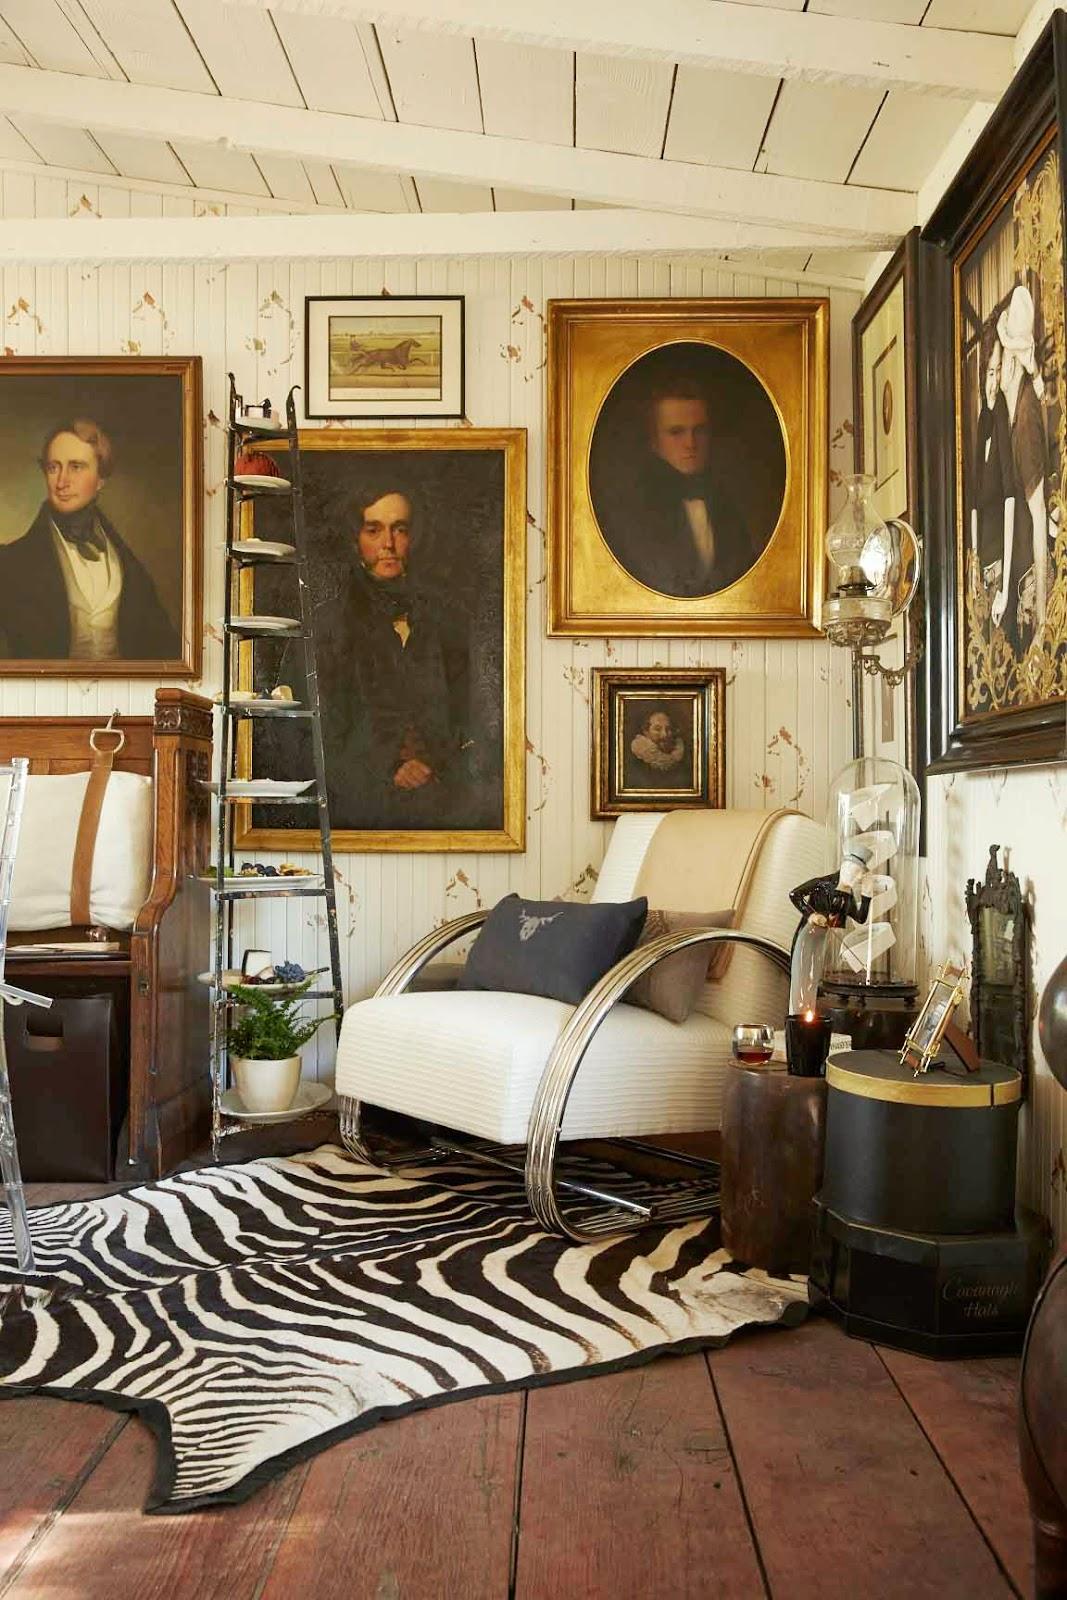 Charmant Positively British: San Francisco Interior Designer Jonathan Rachman  Transforms A Napa Valley Farmhouse Into An Evocative Retreat With A Private  Drinking ...